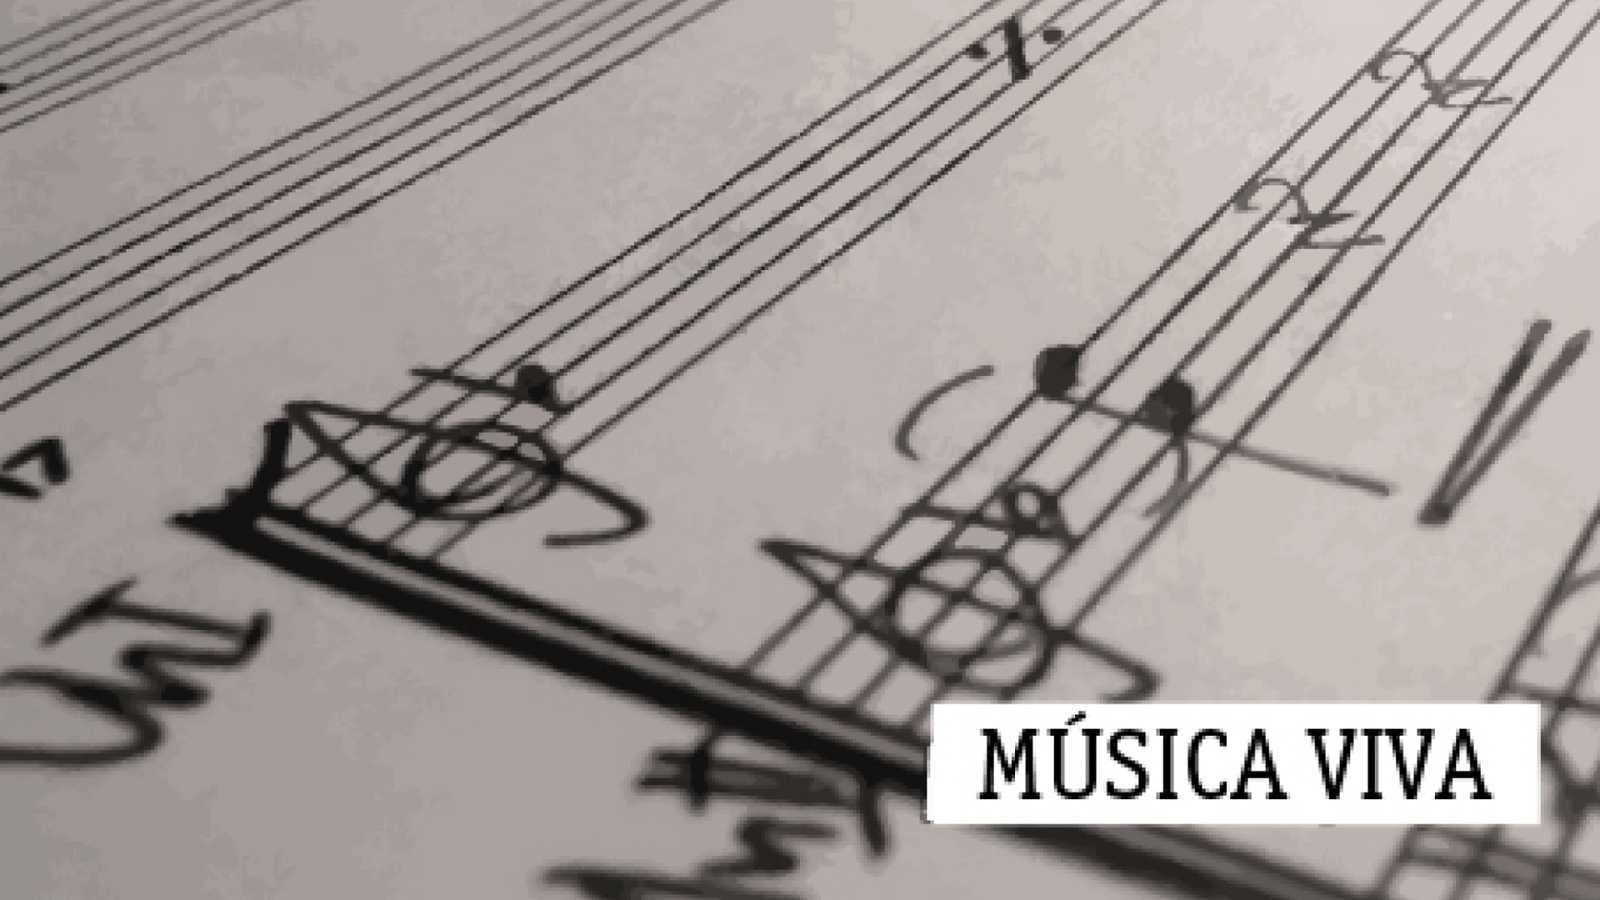 Música viva - Rentrée discográfica - 04/10/20 - escuchar ahora